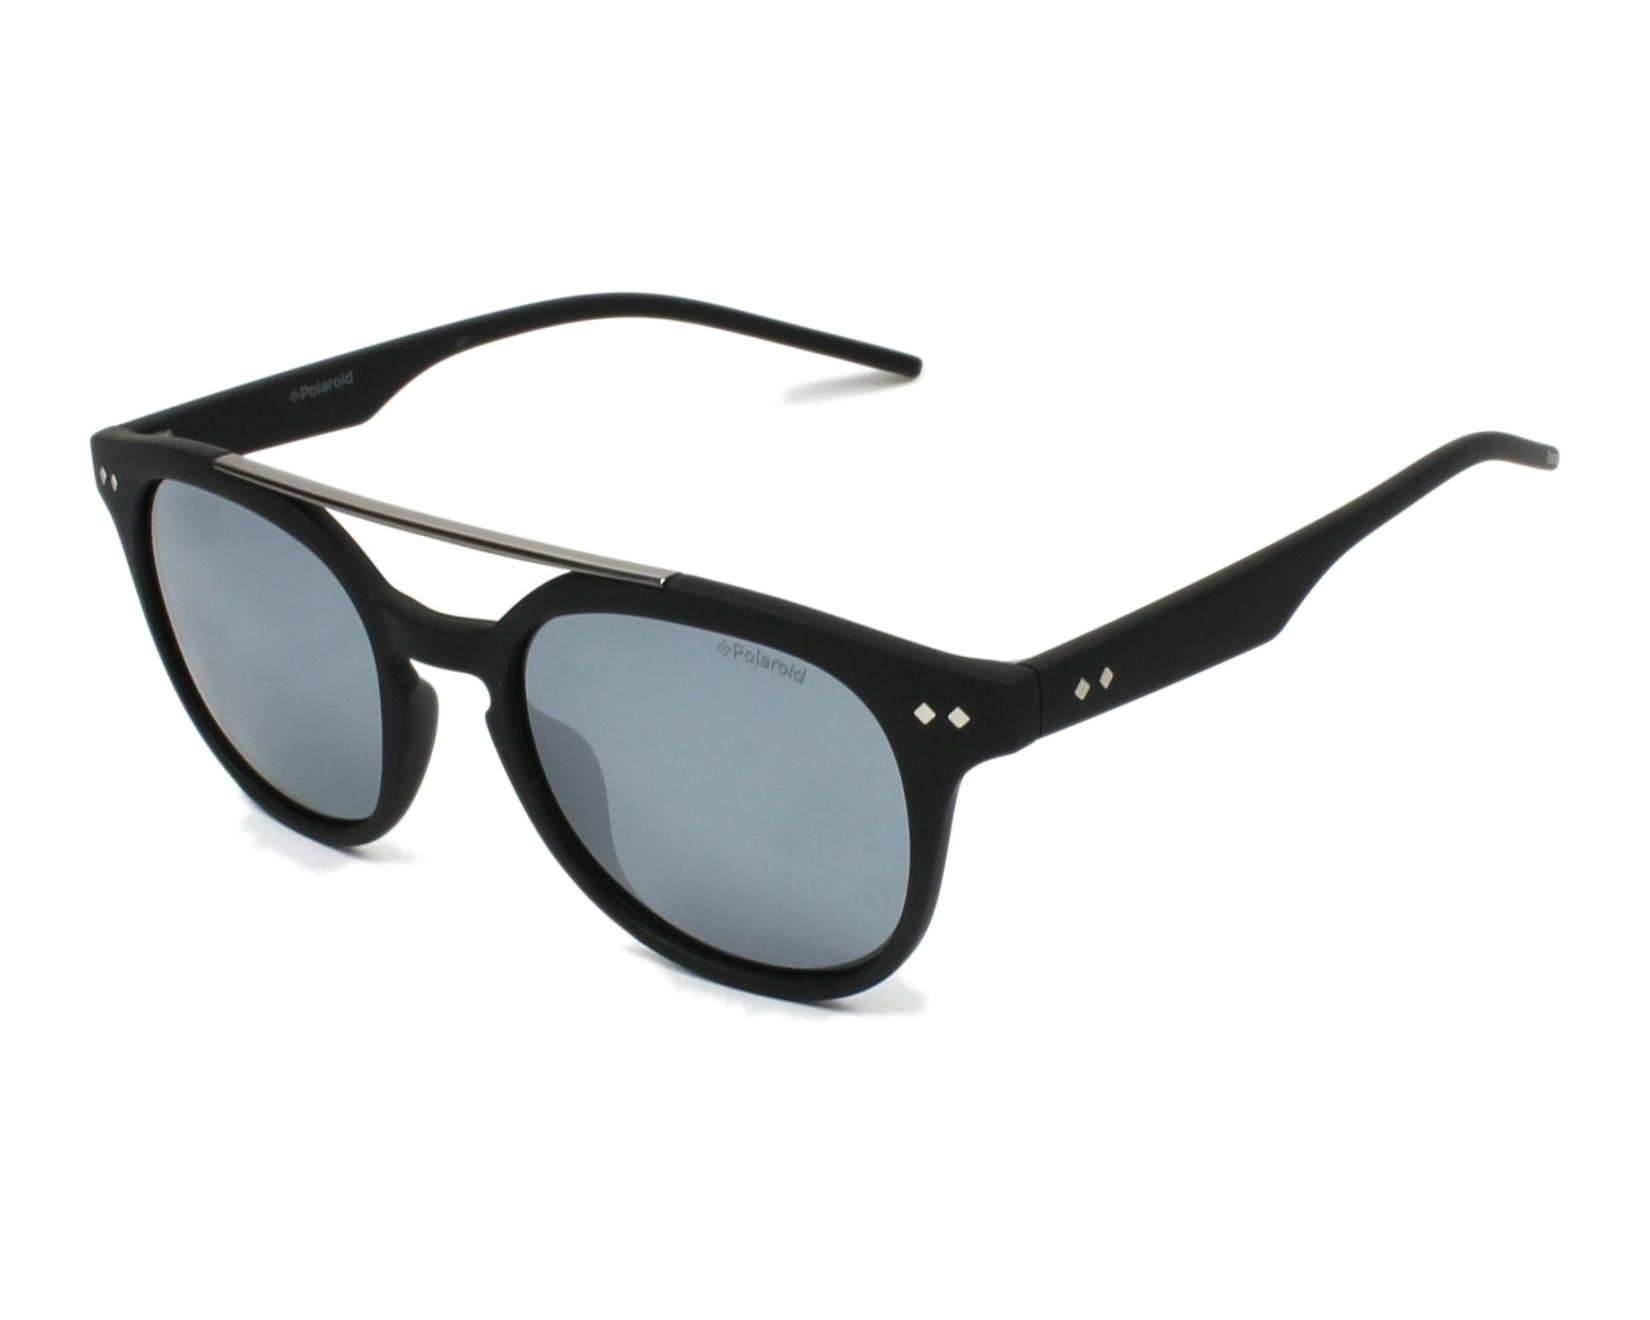 73c3ed5153 Polarizadas. Gafas de sol Polaroid PLD-1023-S DL5/JB 51-20 Negra